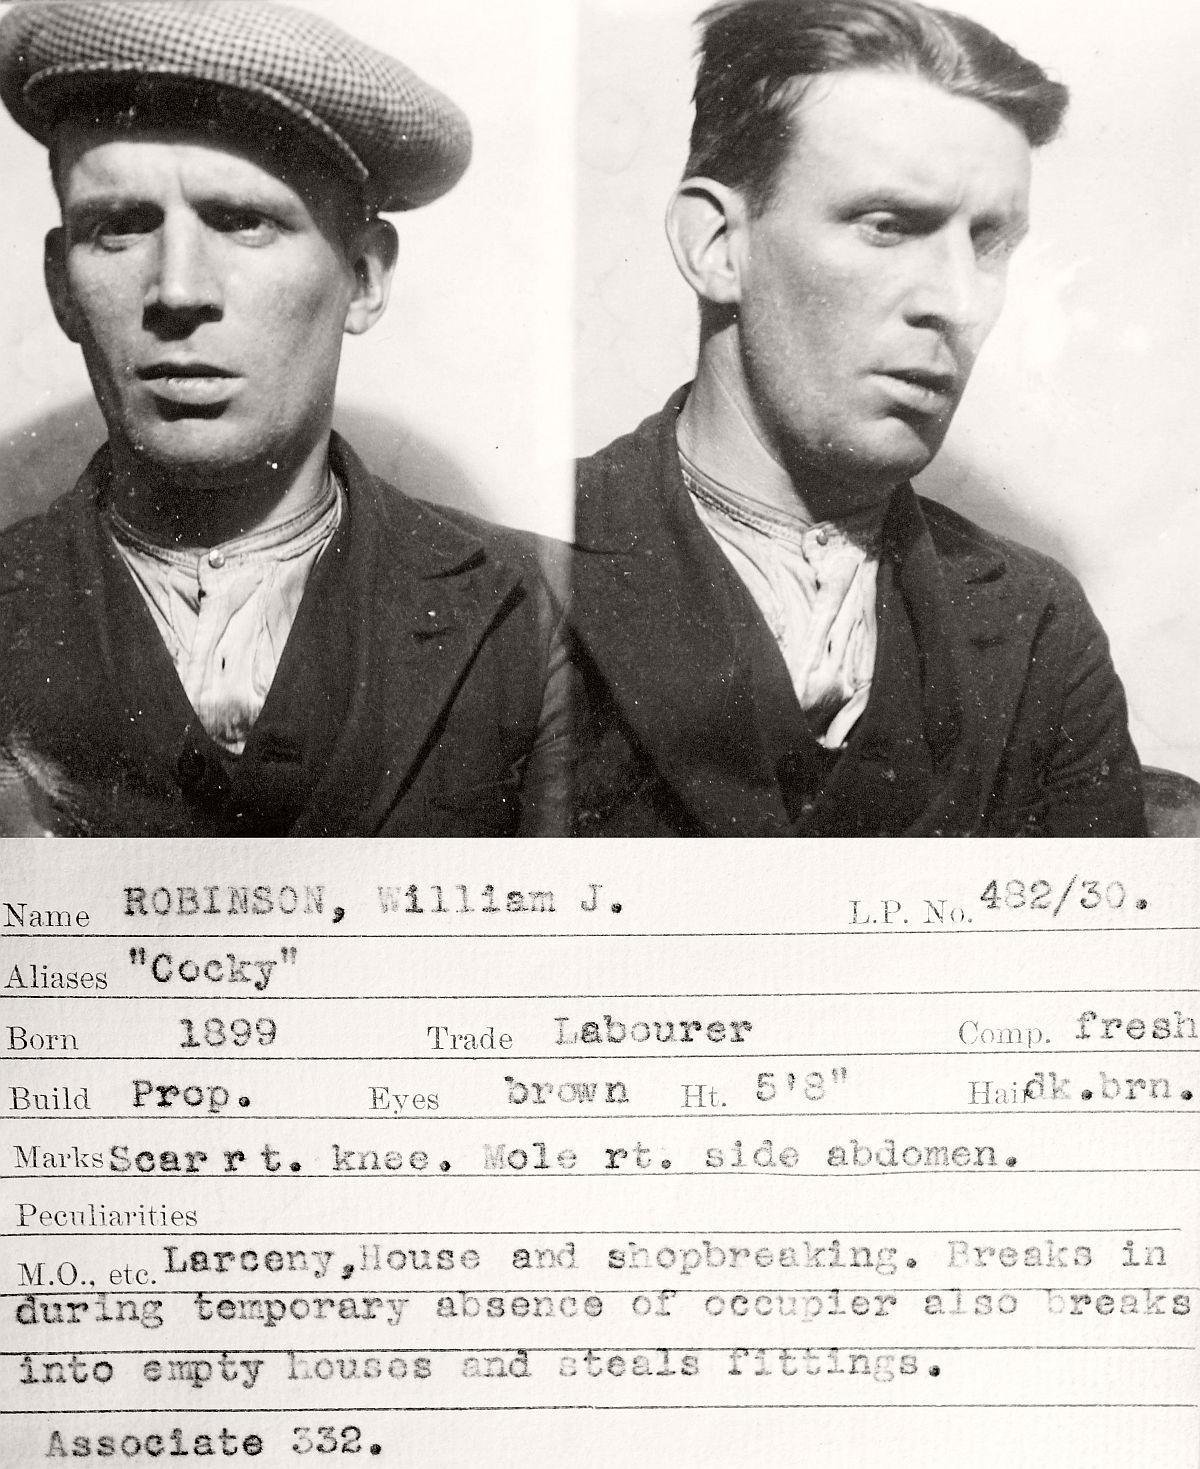 vintage-mug-shot-of-criminals-from-newcastle-upon-tyne-1930s-20